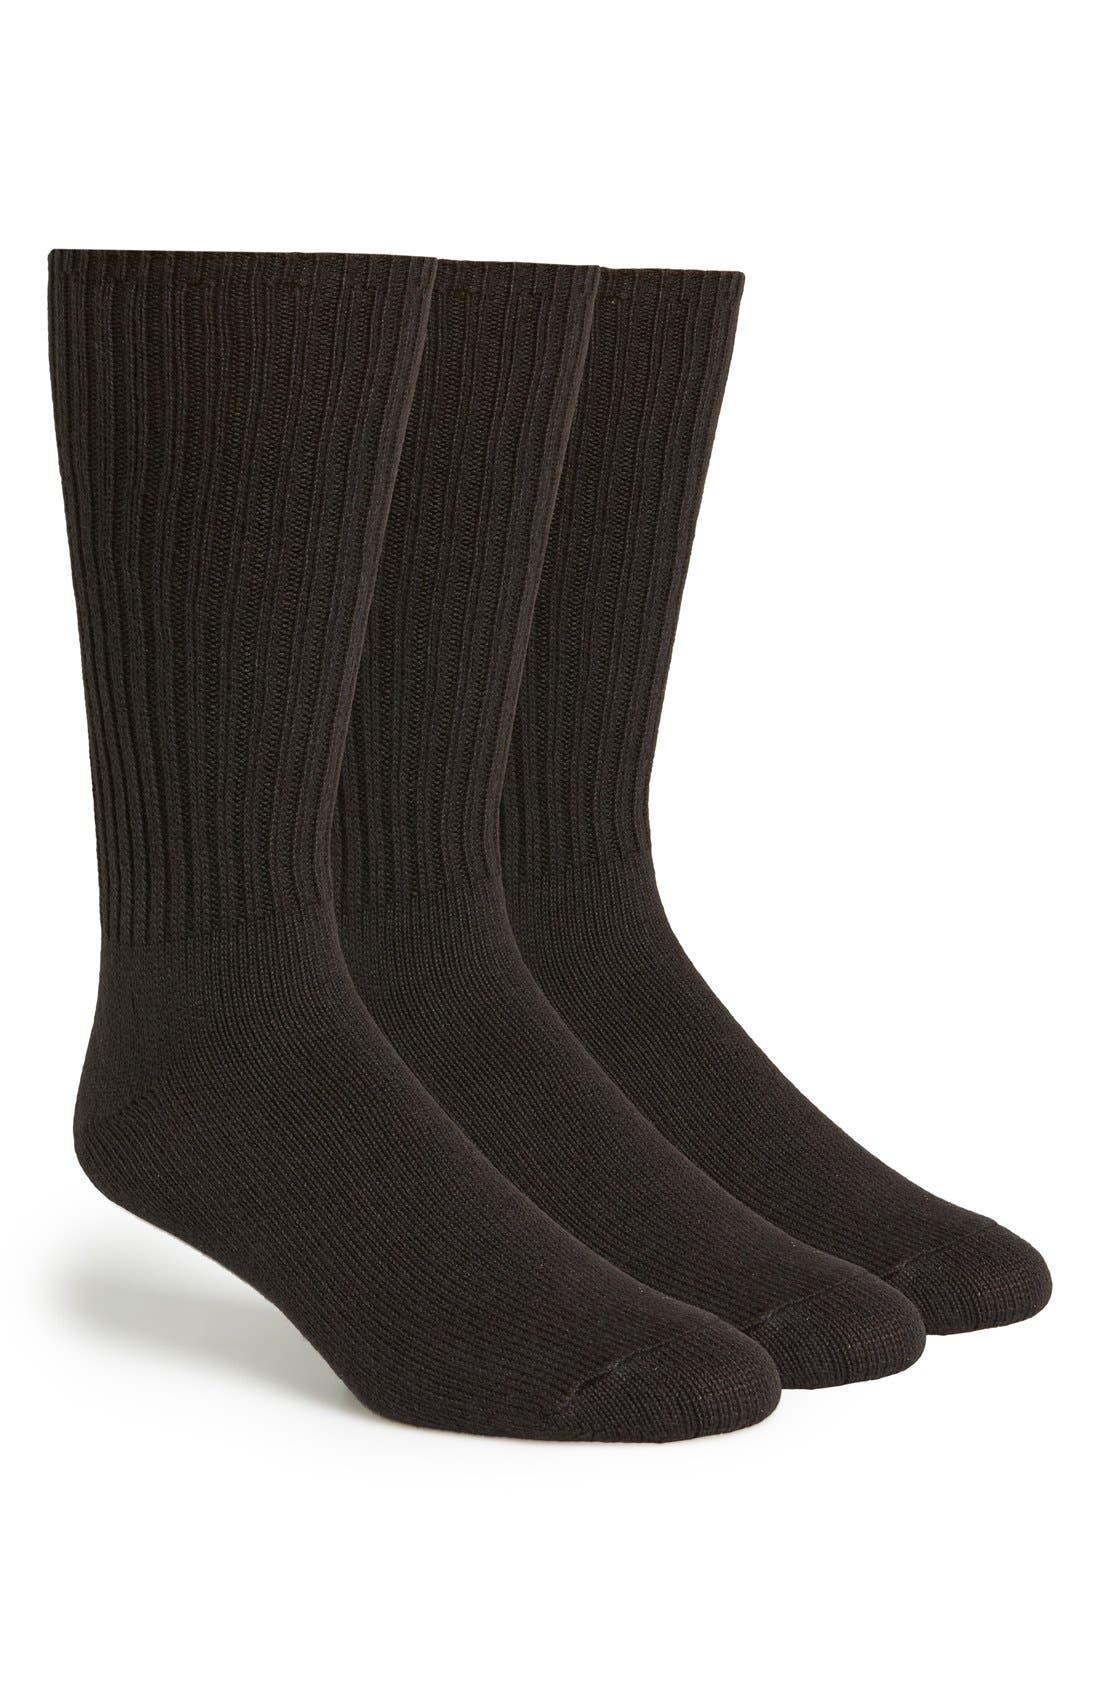 3-Pack Casual Socks,                             Main thumbnail 1, color,                             BLACK